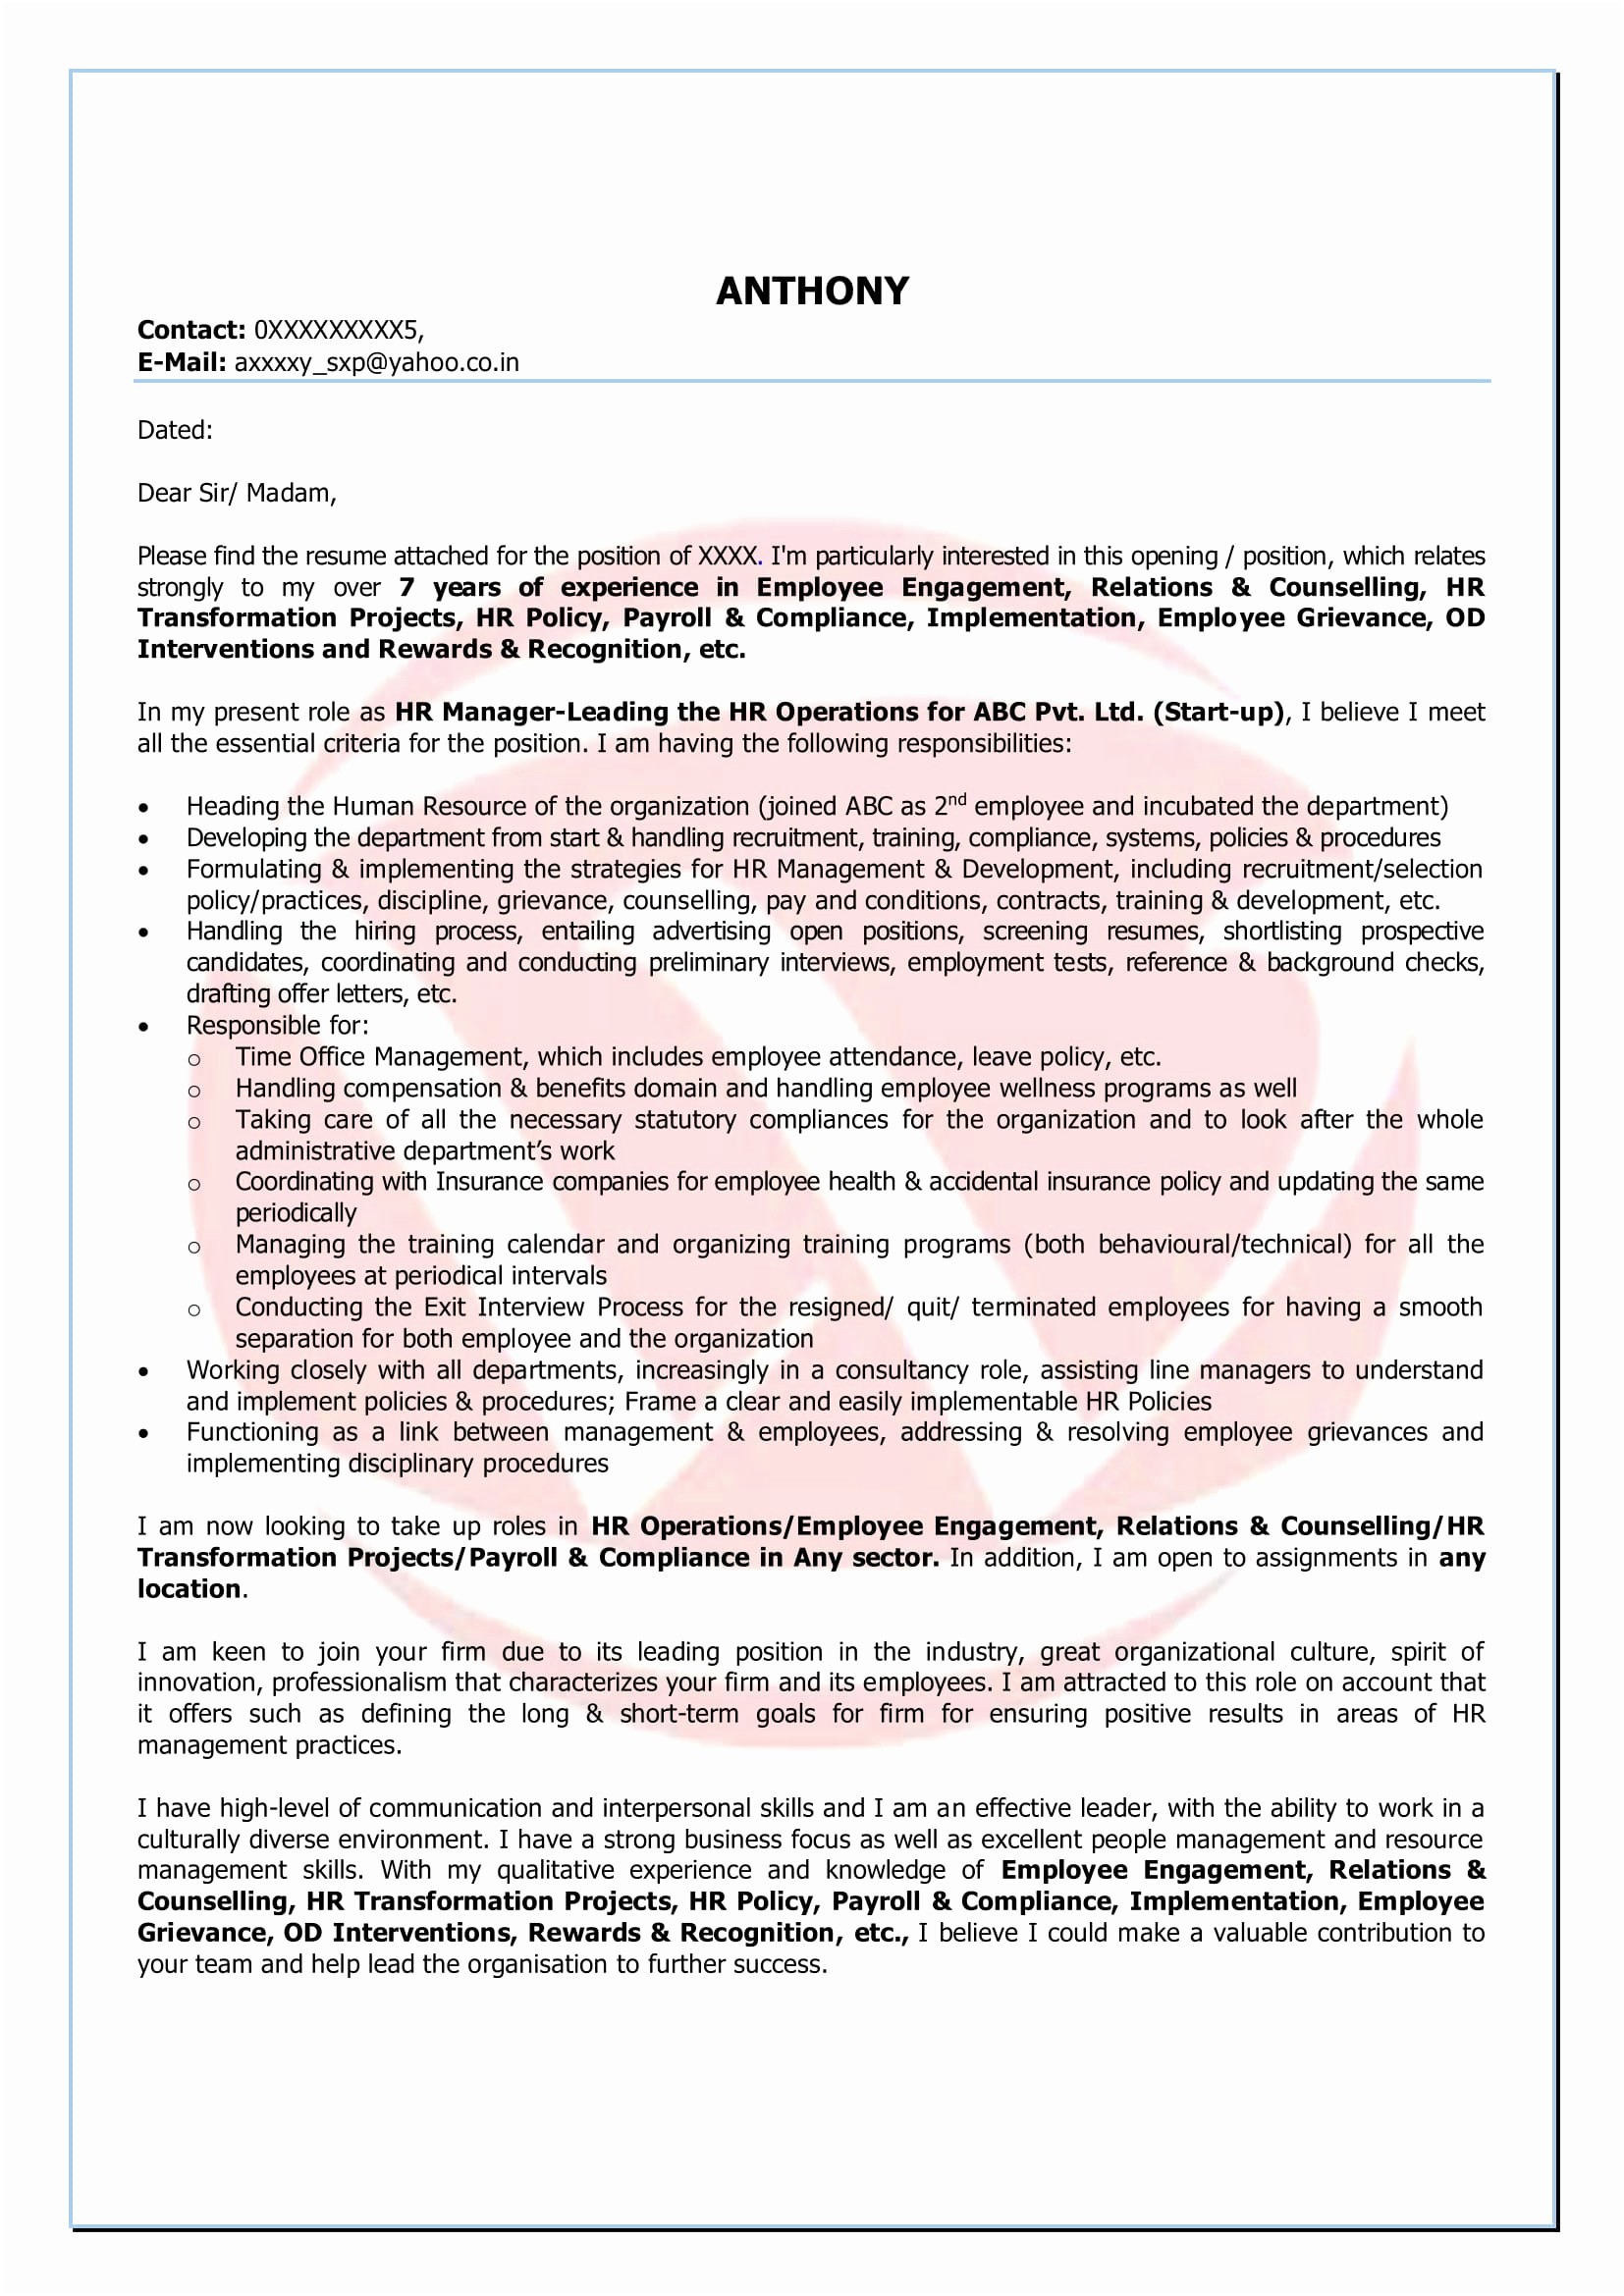 Missionary Letter Template - Example Eportfolio In Powerpoint New E Portfolio Templates 48